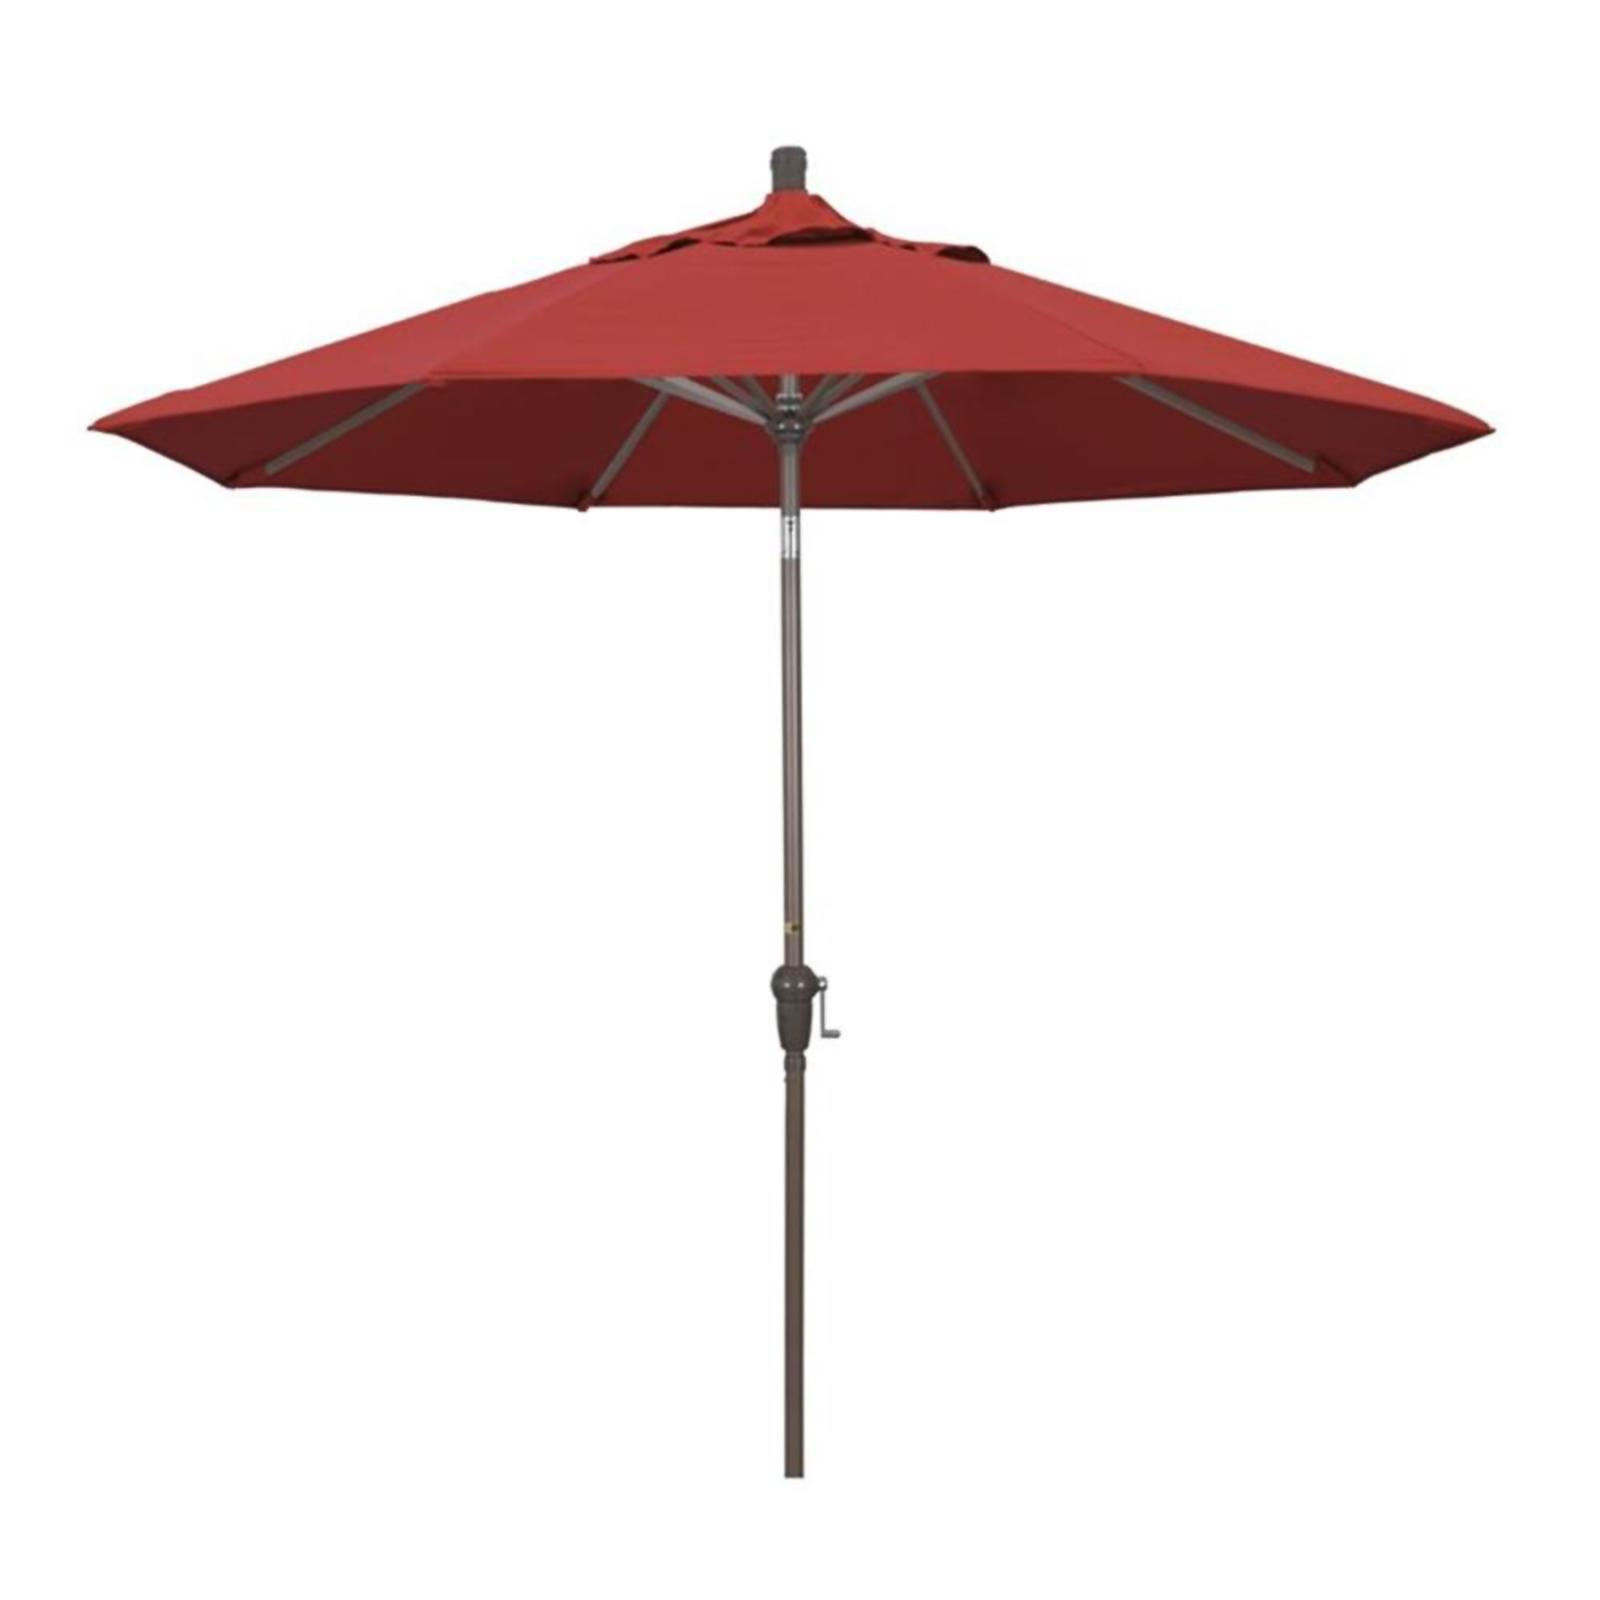 California Umbrella SDAU908900-F13 Sunset Series Champagne Patio Umbrella, Red - 9 ft. x 8 Ribs PartNumber: SPM10347883118